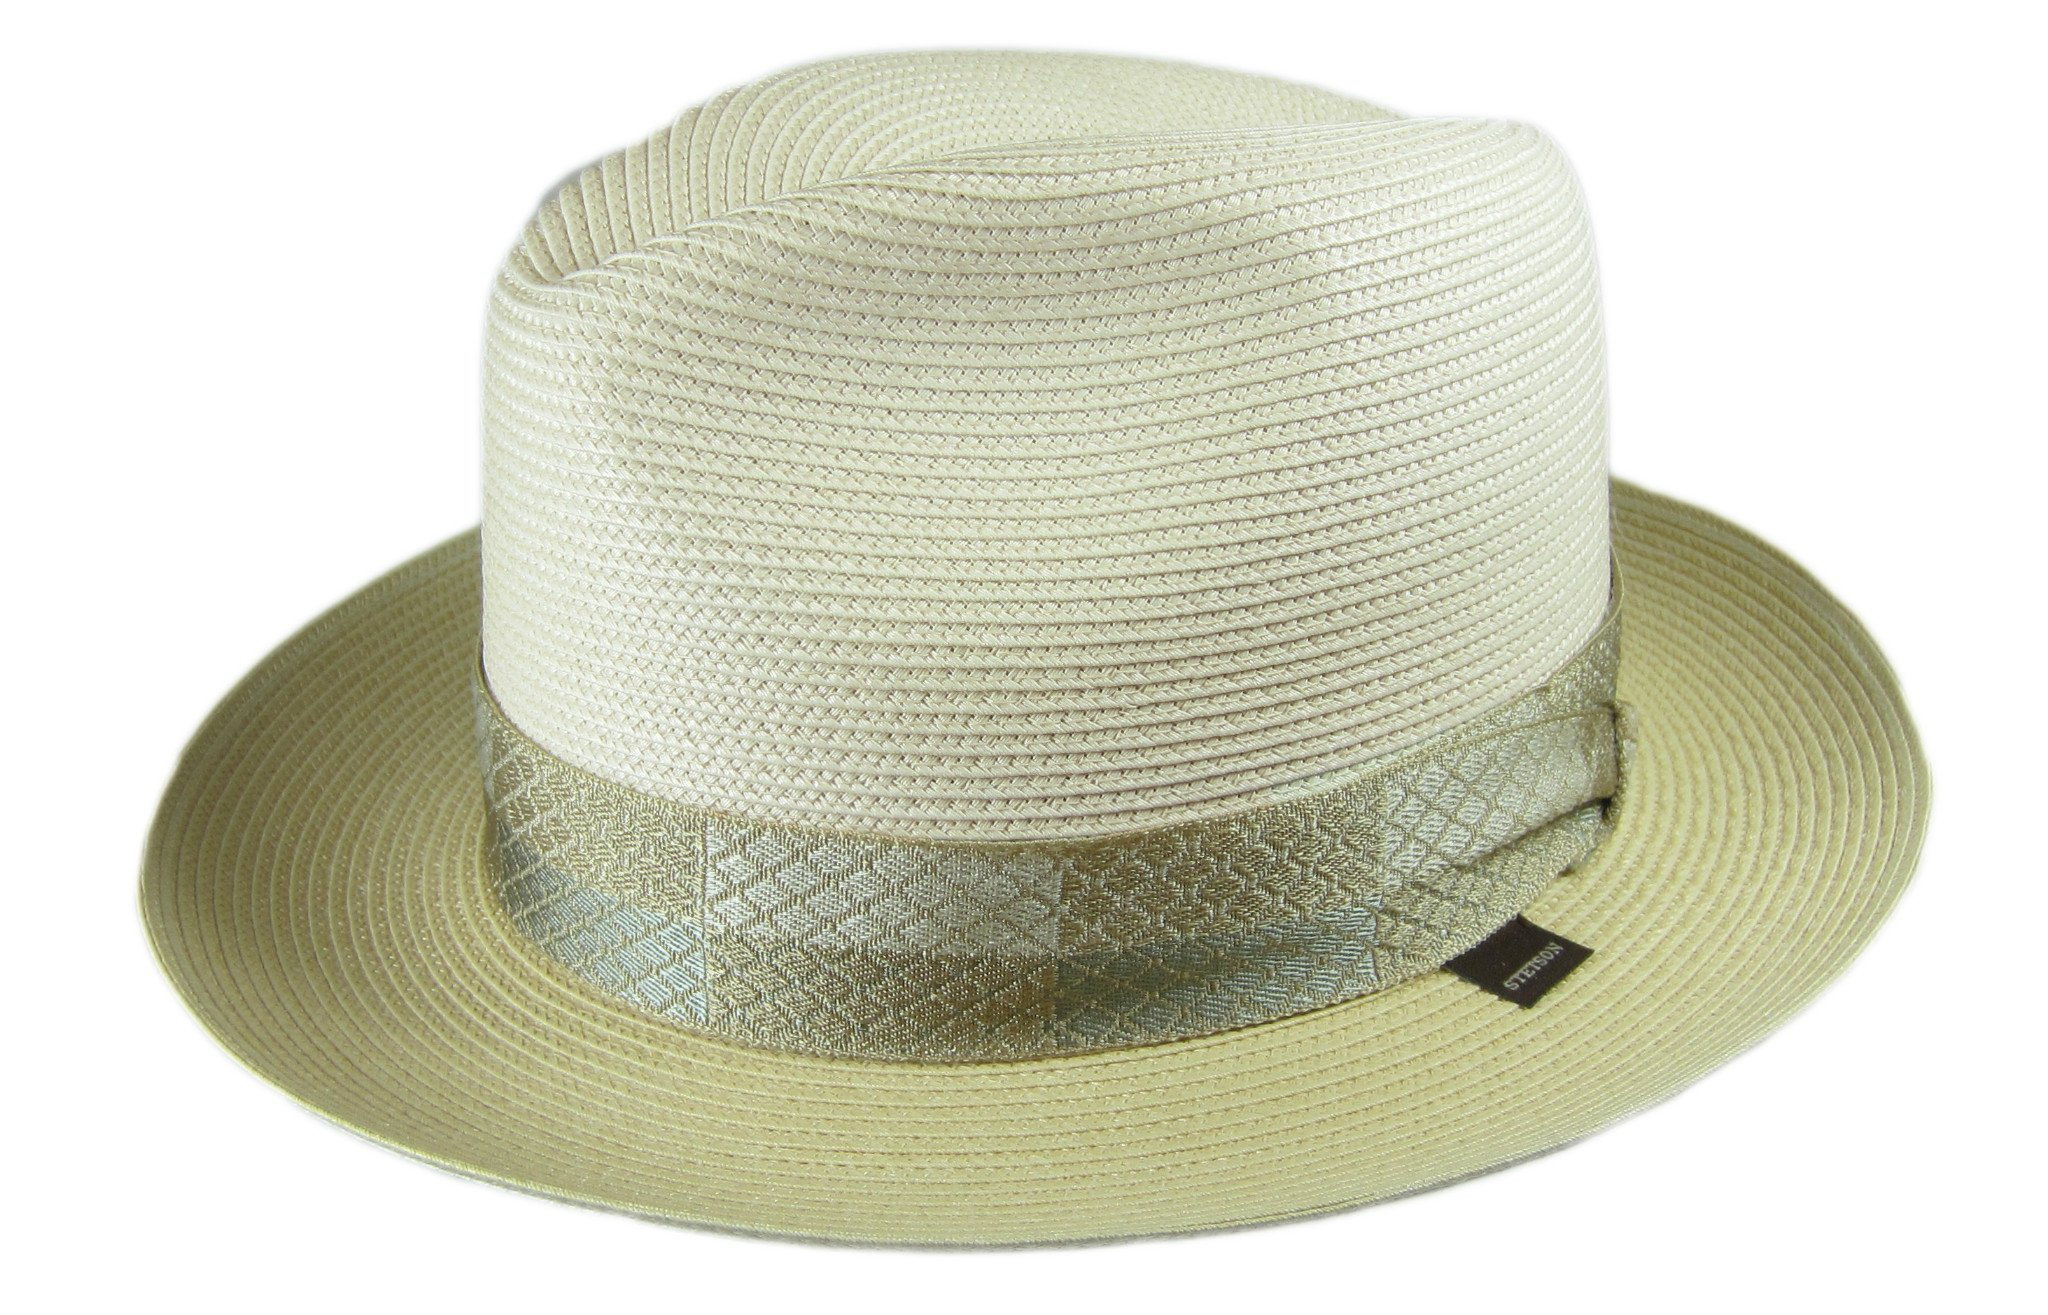 a1e5499960d01 Details about Beige Sand Stetson Men s Andover Florenine Milan Straw Hat